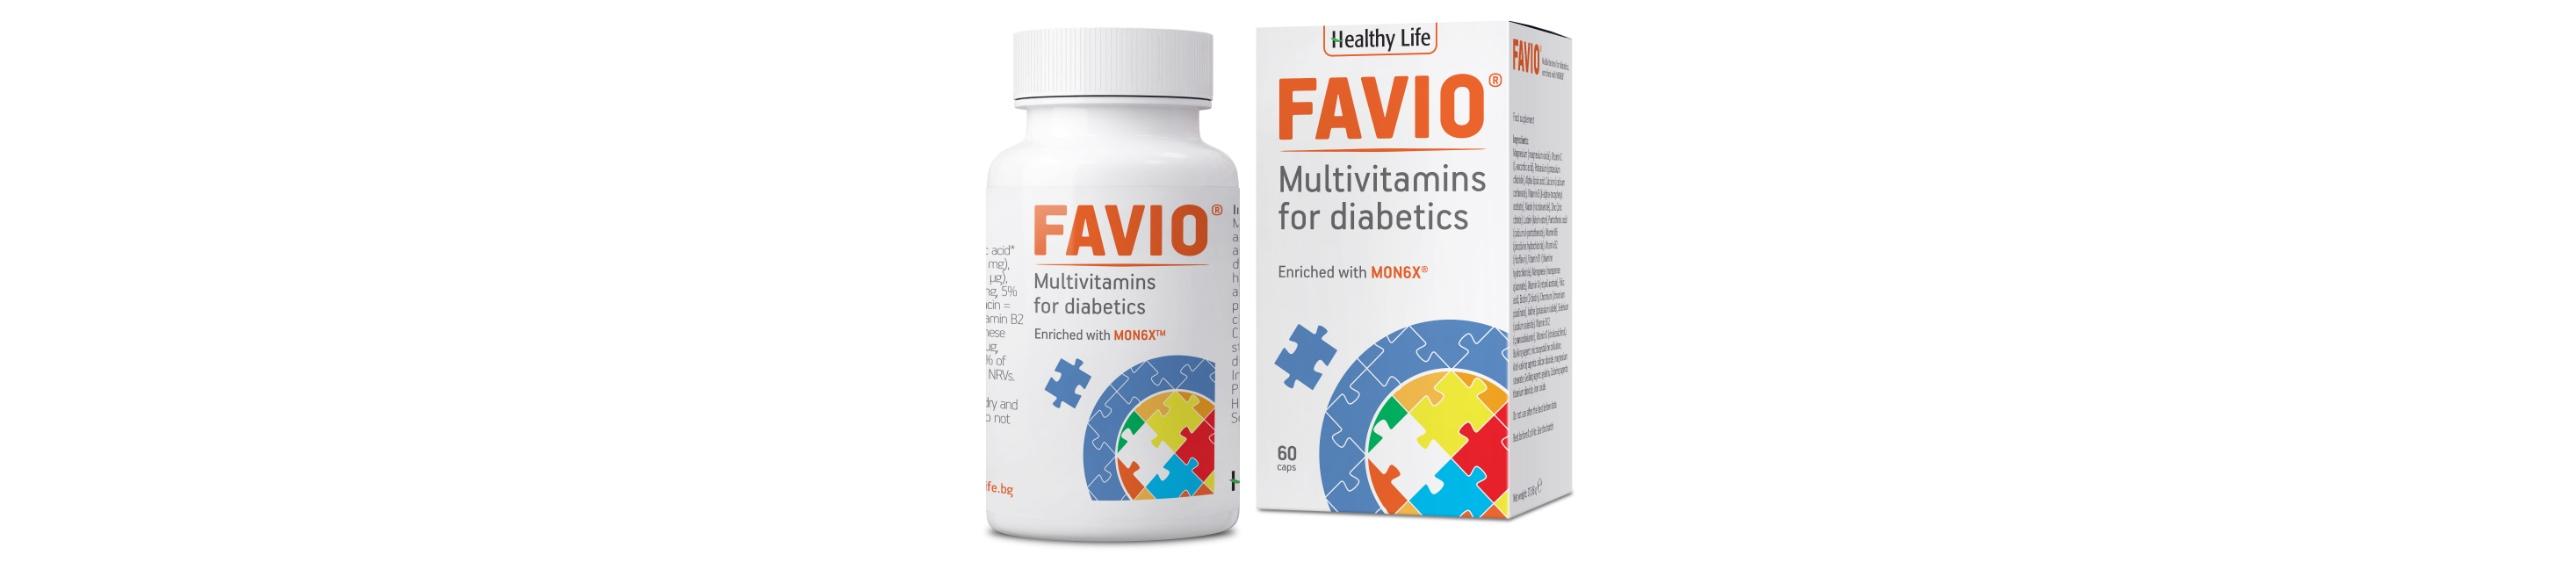 P3-Slider-img-Favio1